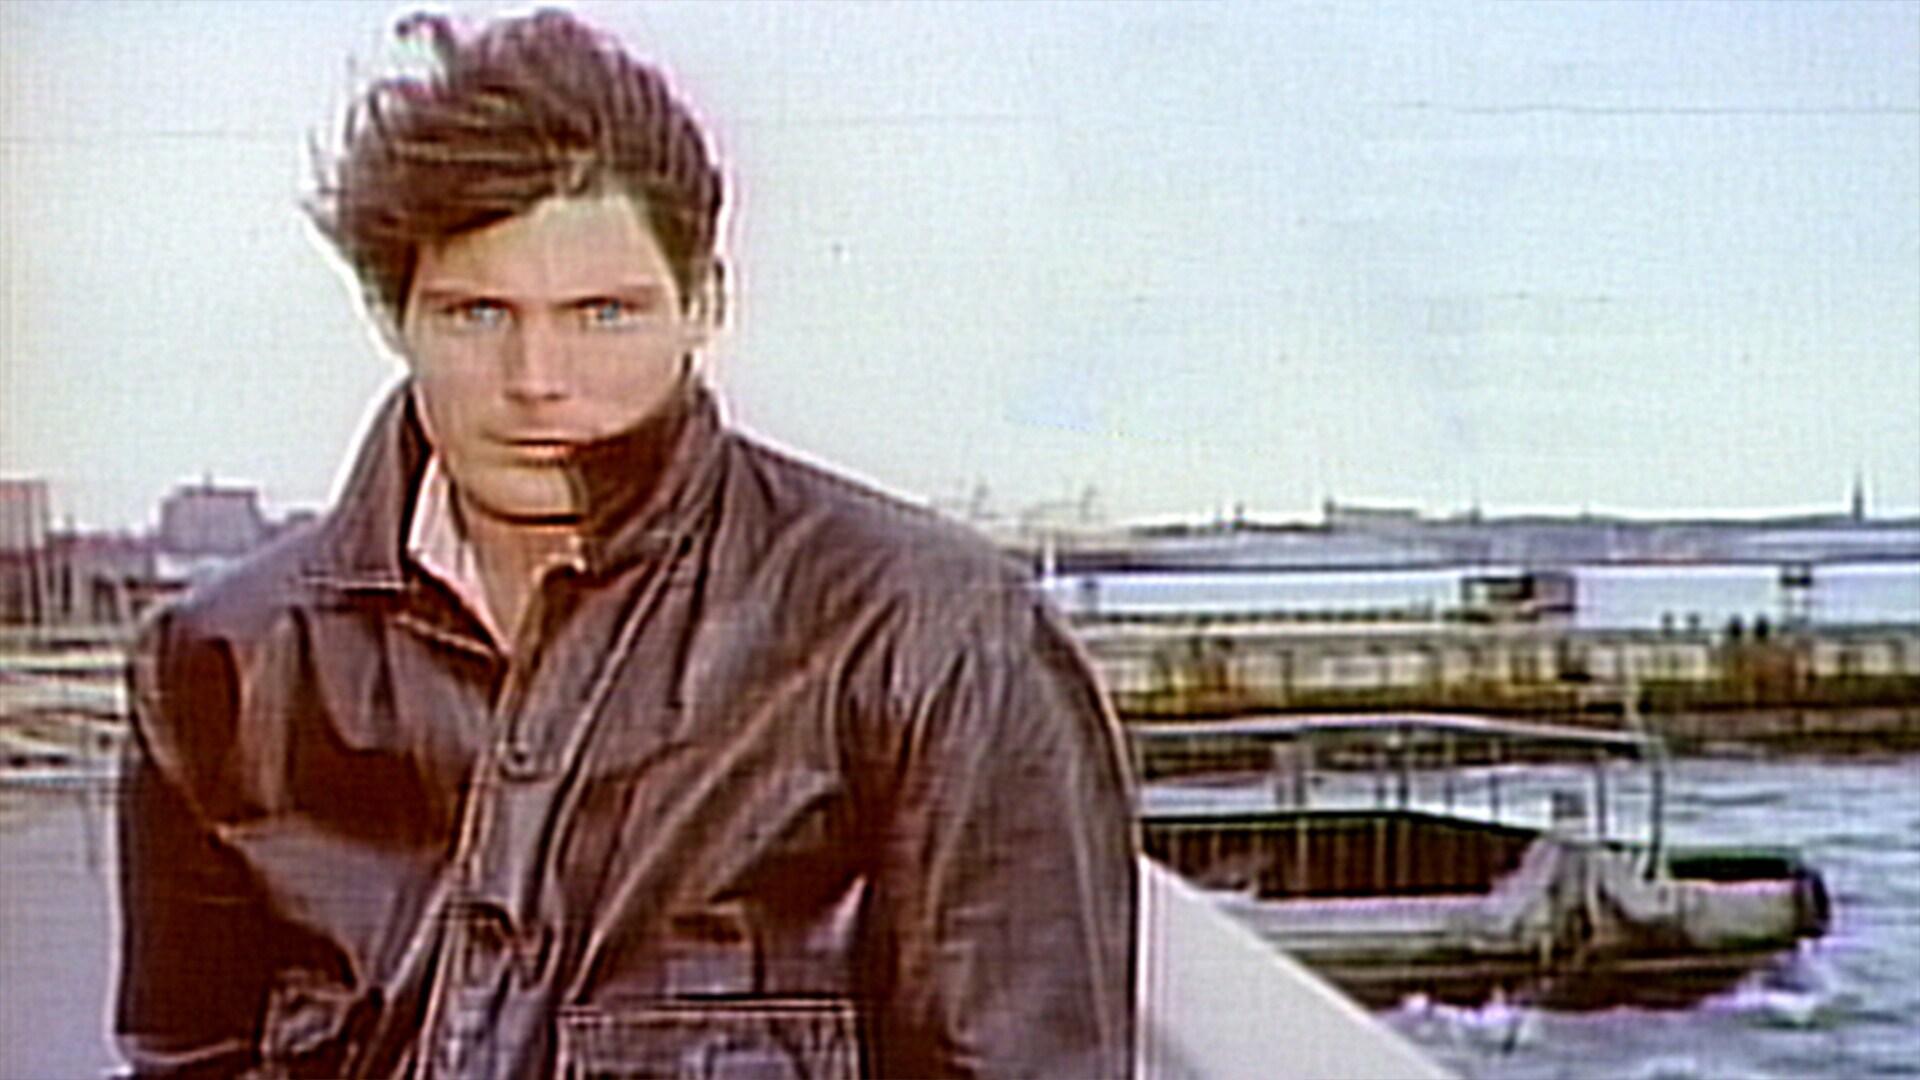 Christopher Reeve: April 6, 1985